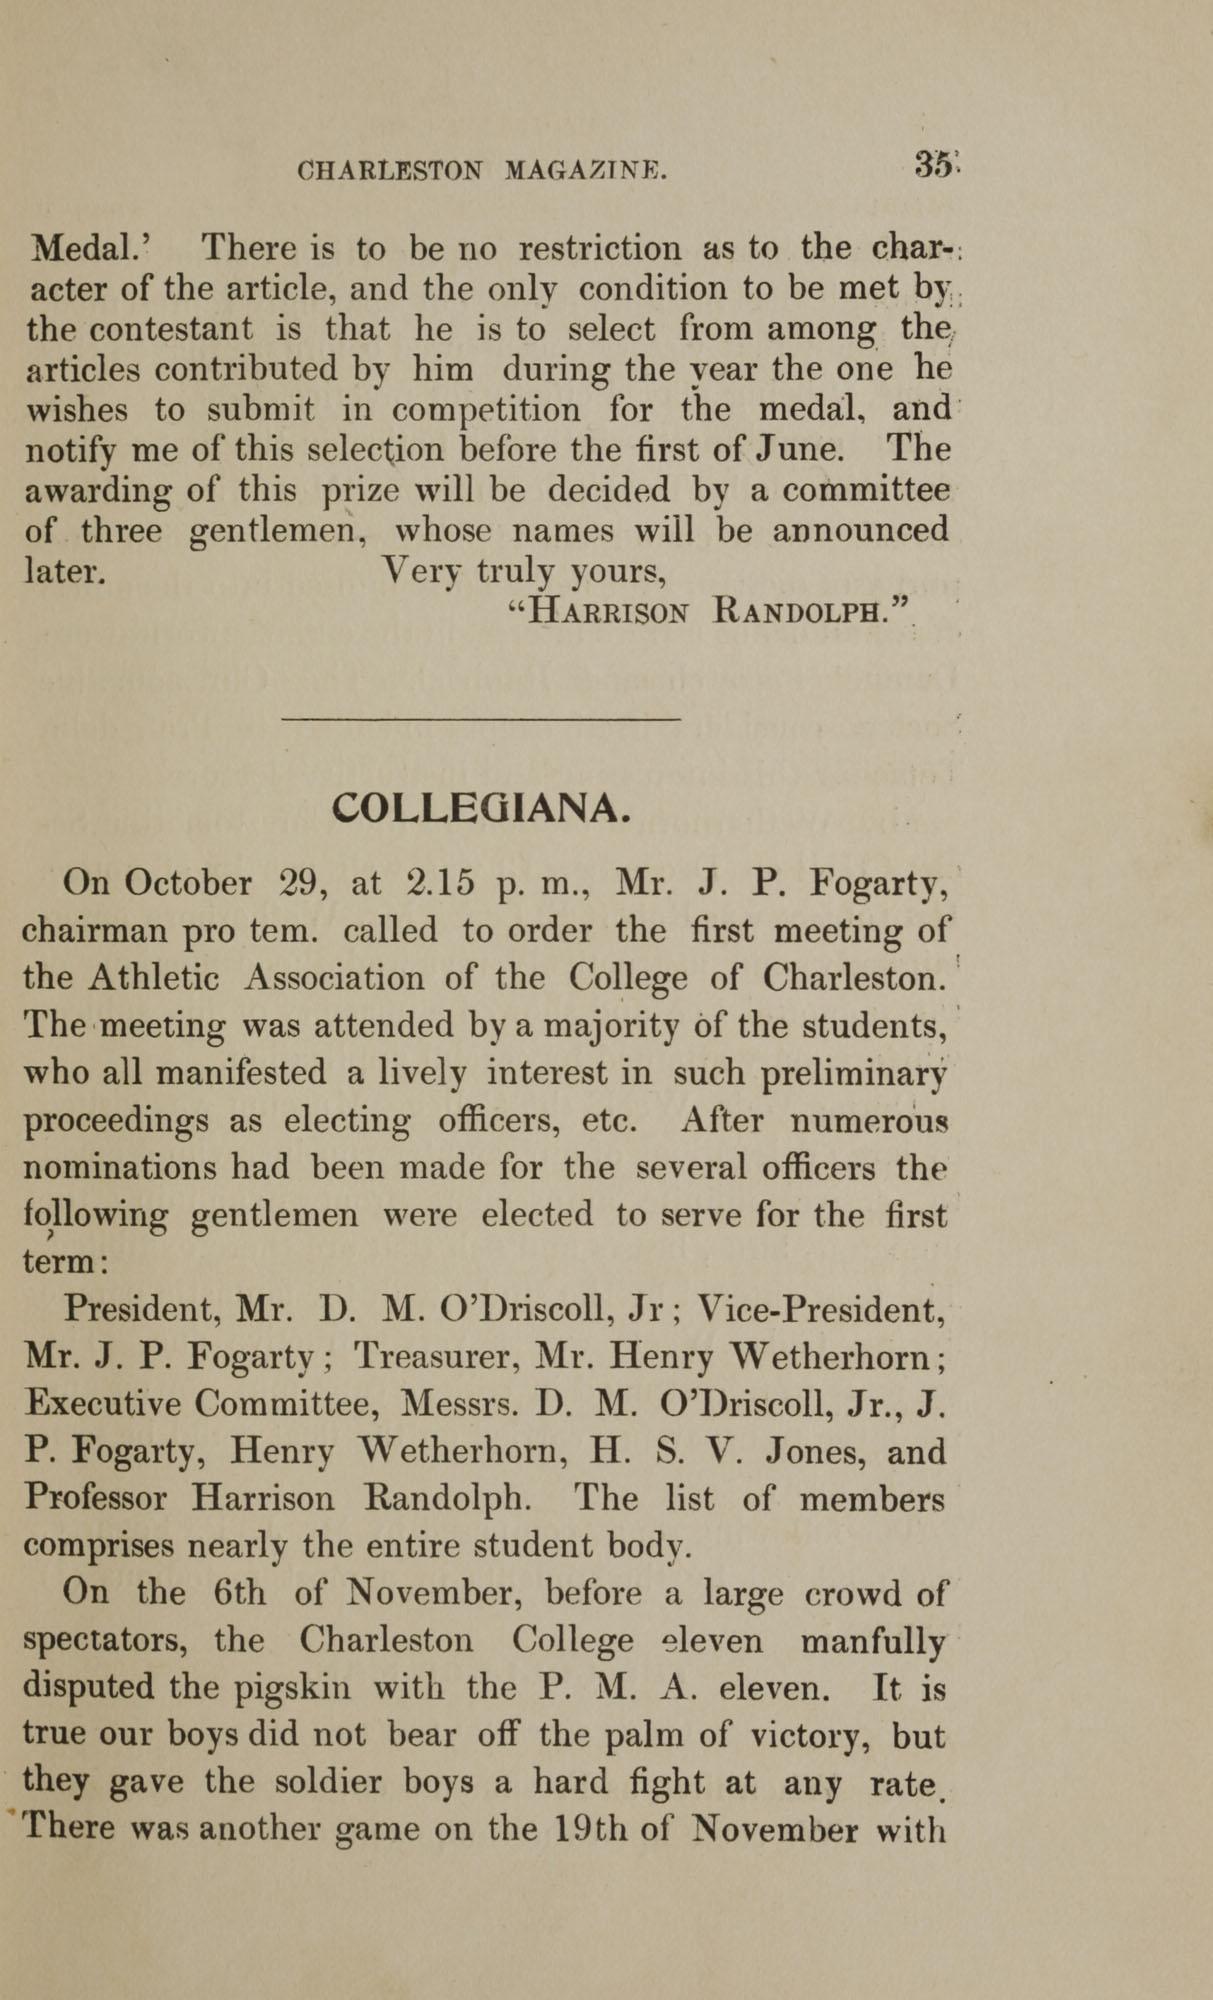 College of Charleston Magazine, 1898, Vol I. No. 1, page 35